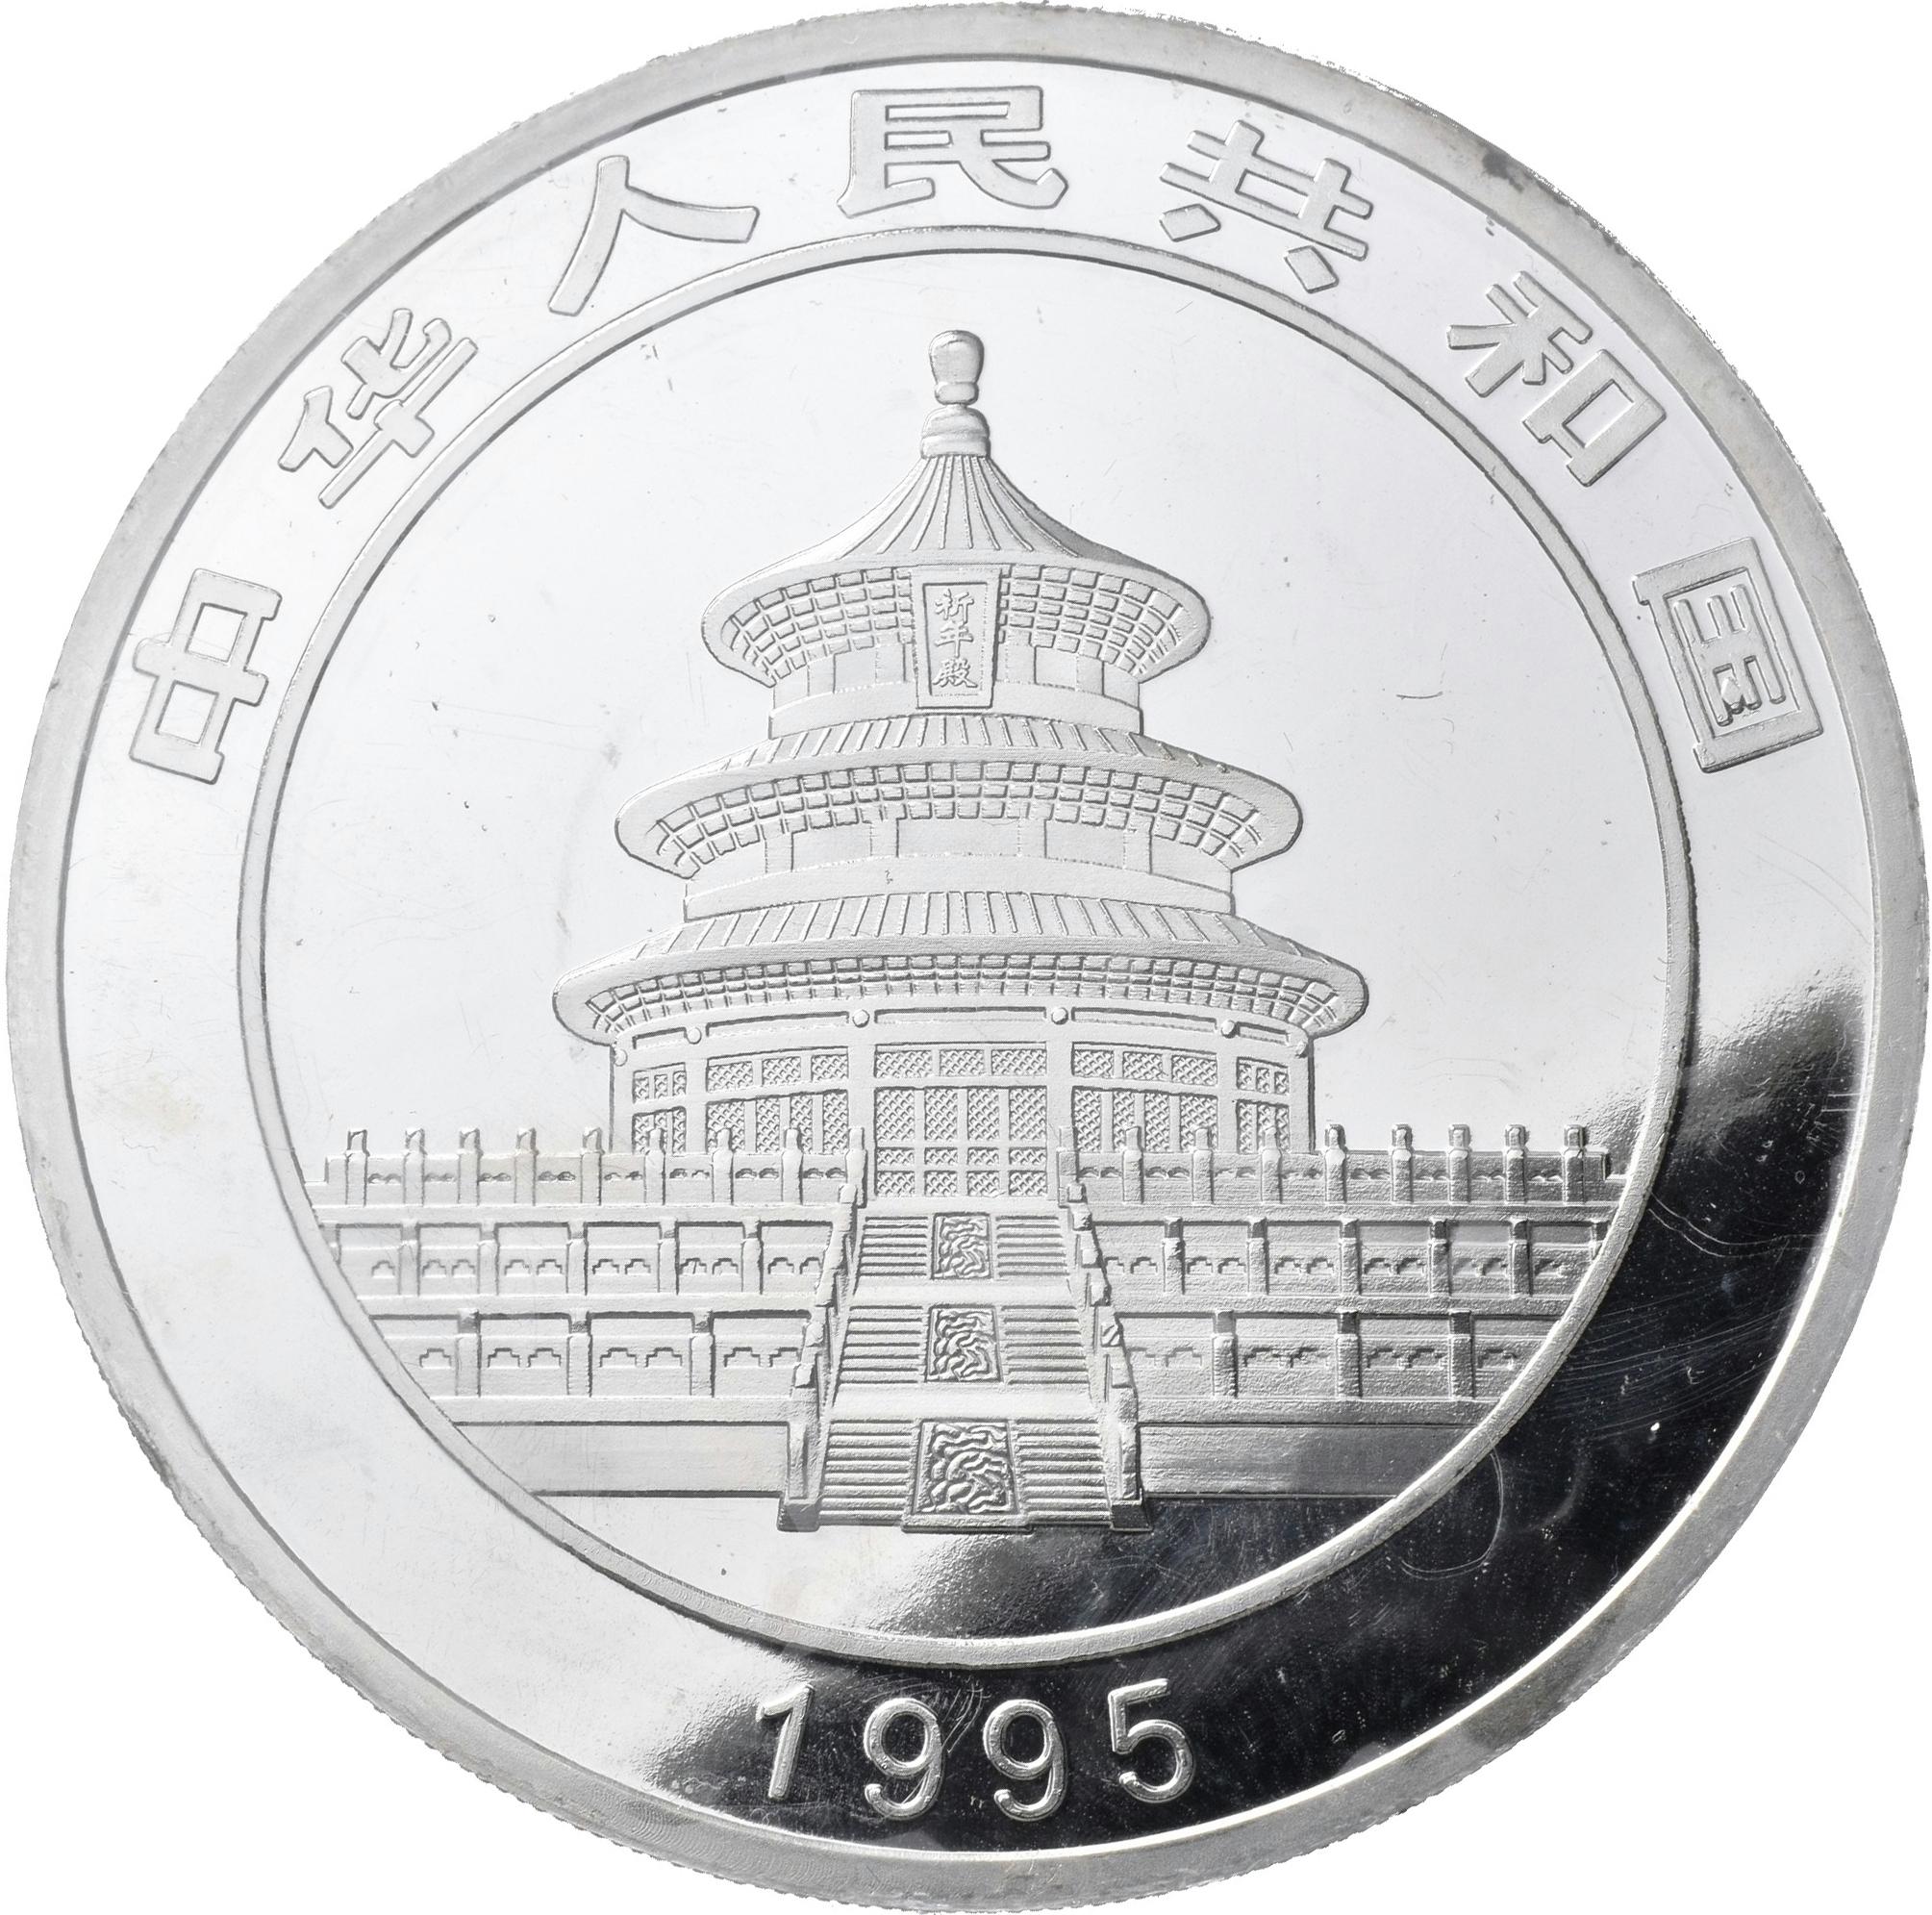 Lot 05059 - China - Volksrepublik | Übersee  -  Auktionshaus Christoph Gärtner GmbH & Co. KG Sale #45 Banknotes Germany/Numismatics